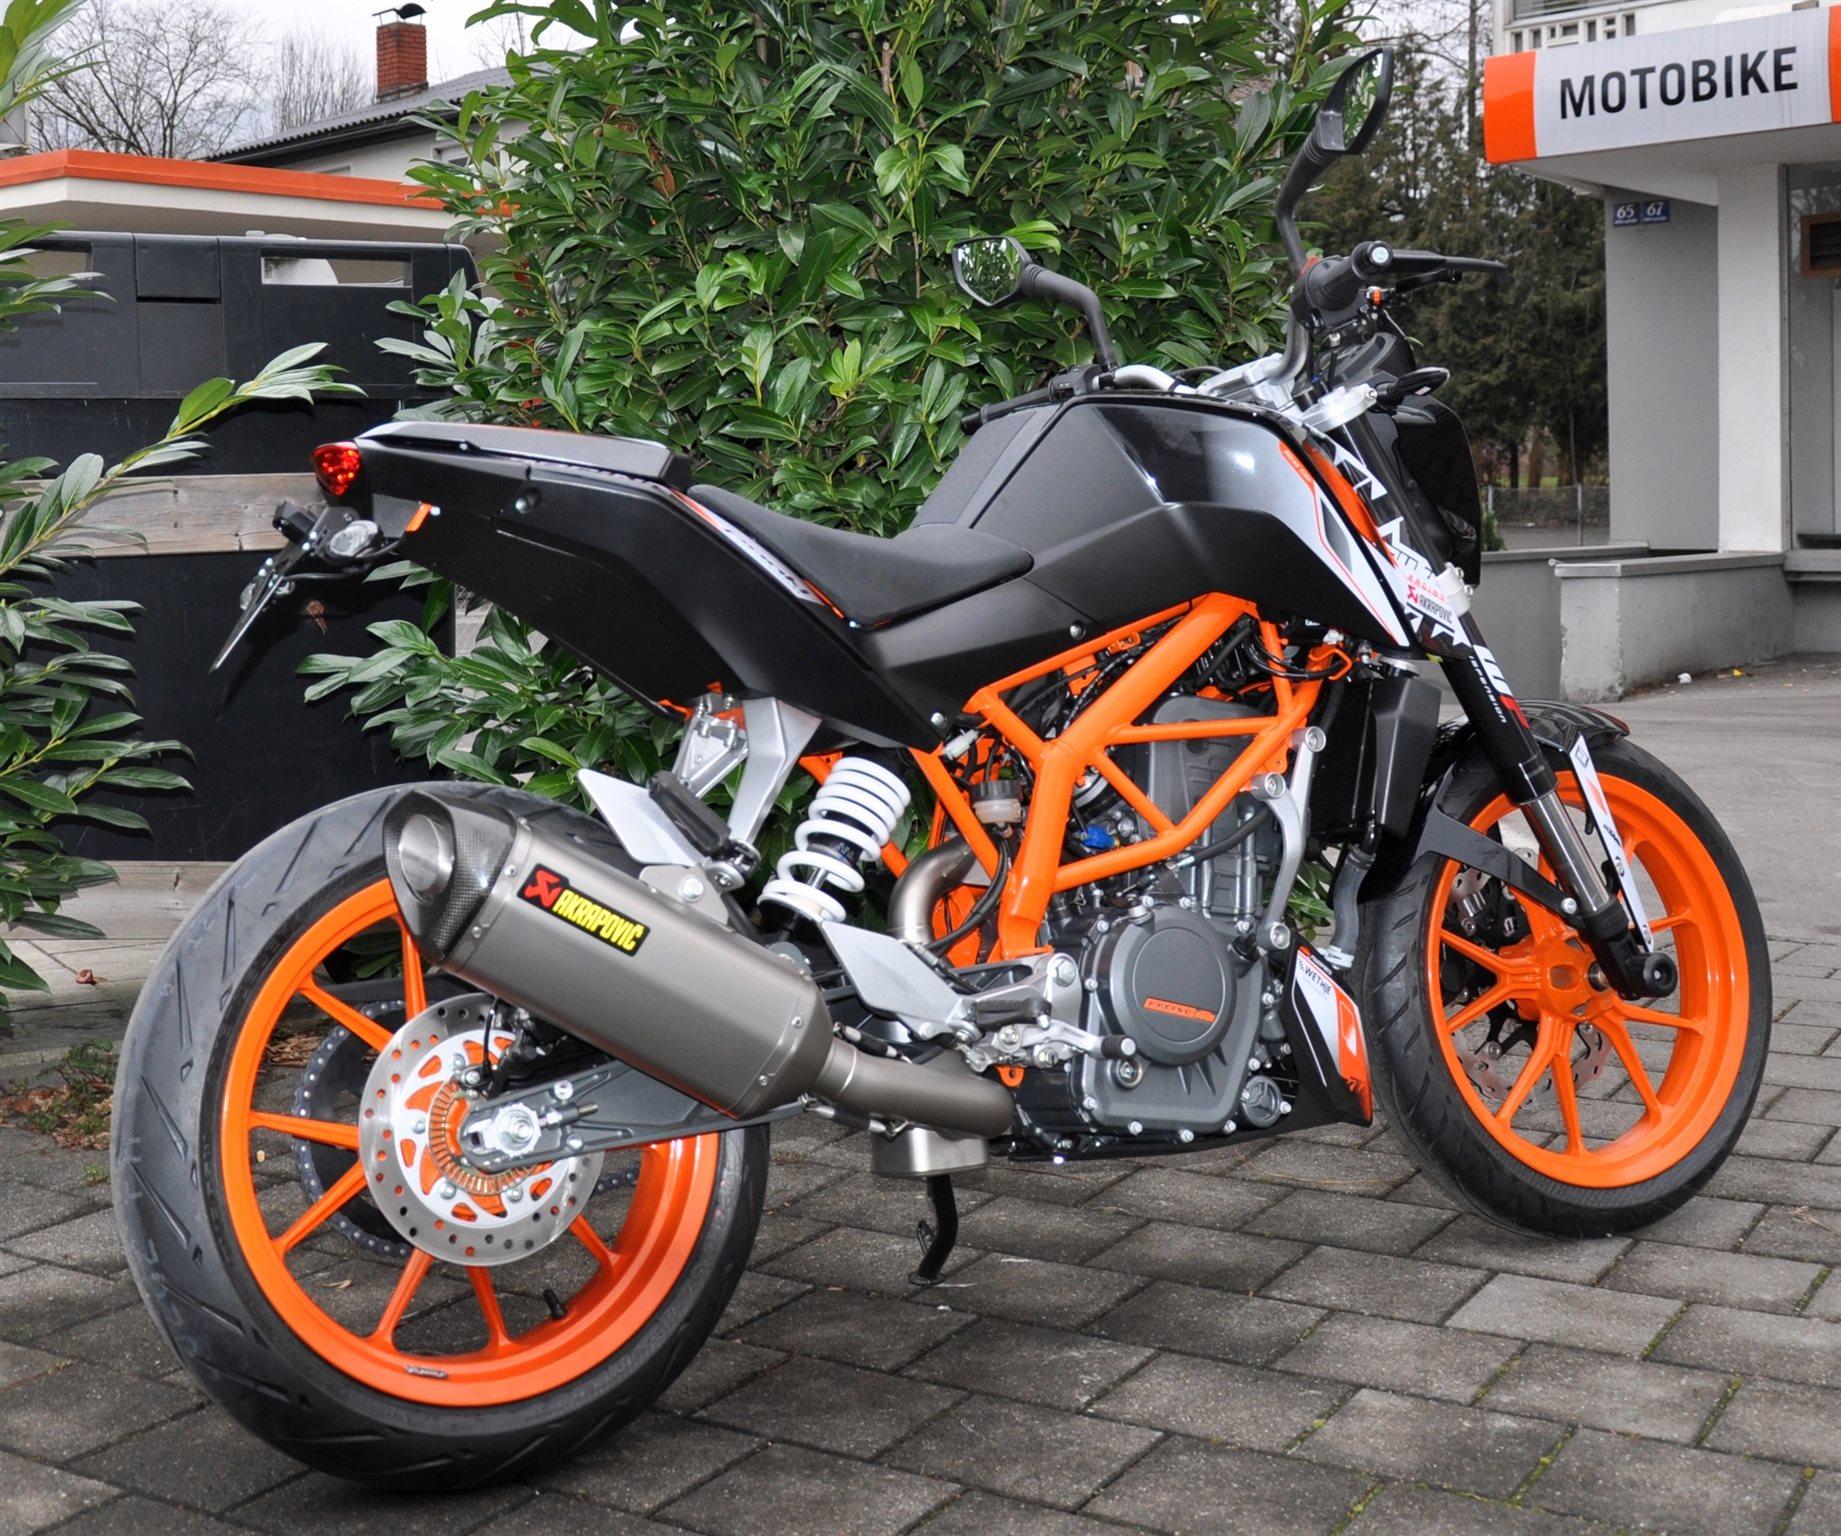 umgebautes motorrad ktm 390 duke von motobike handels gmbh. Black Bedroom Furniture Sets. Home Design Ideas